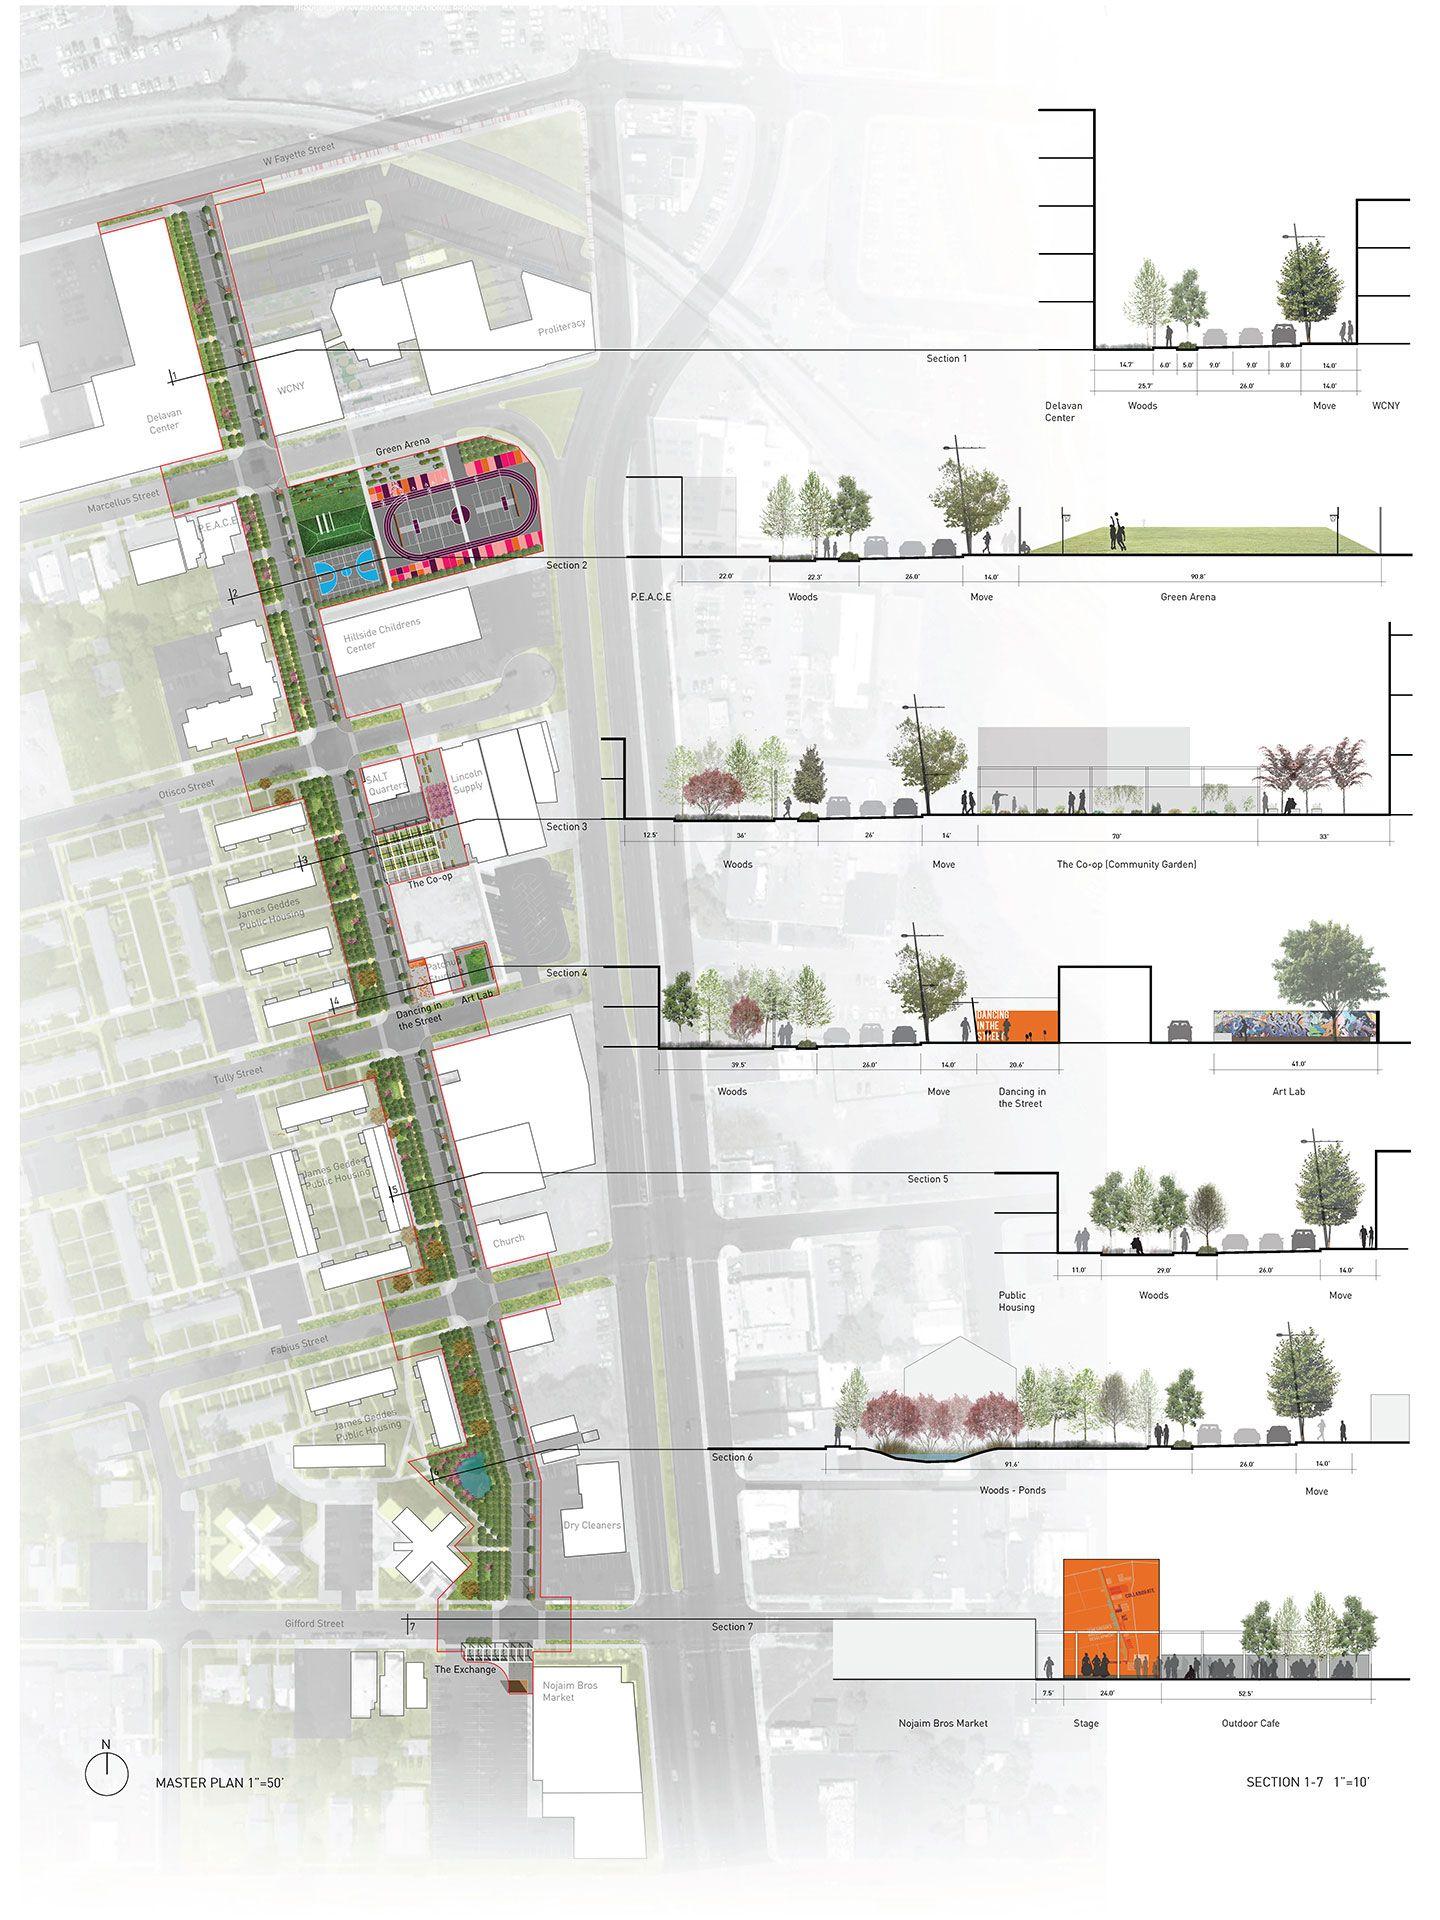 Sections Off Of Corridor Urban Design Plan Urban Design